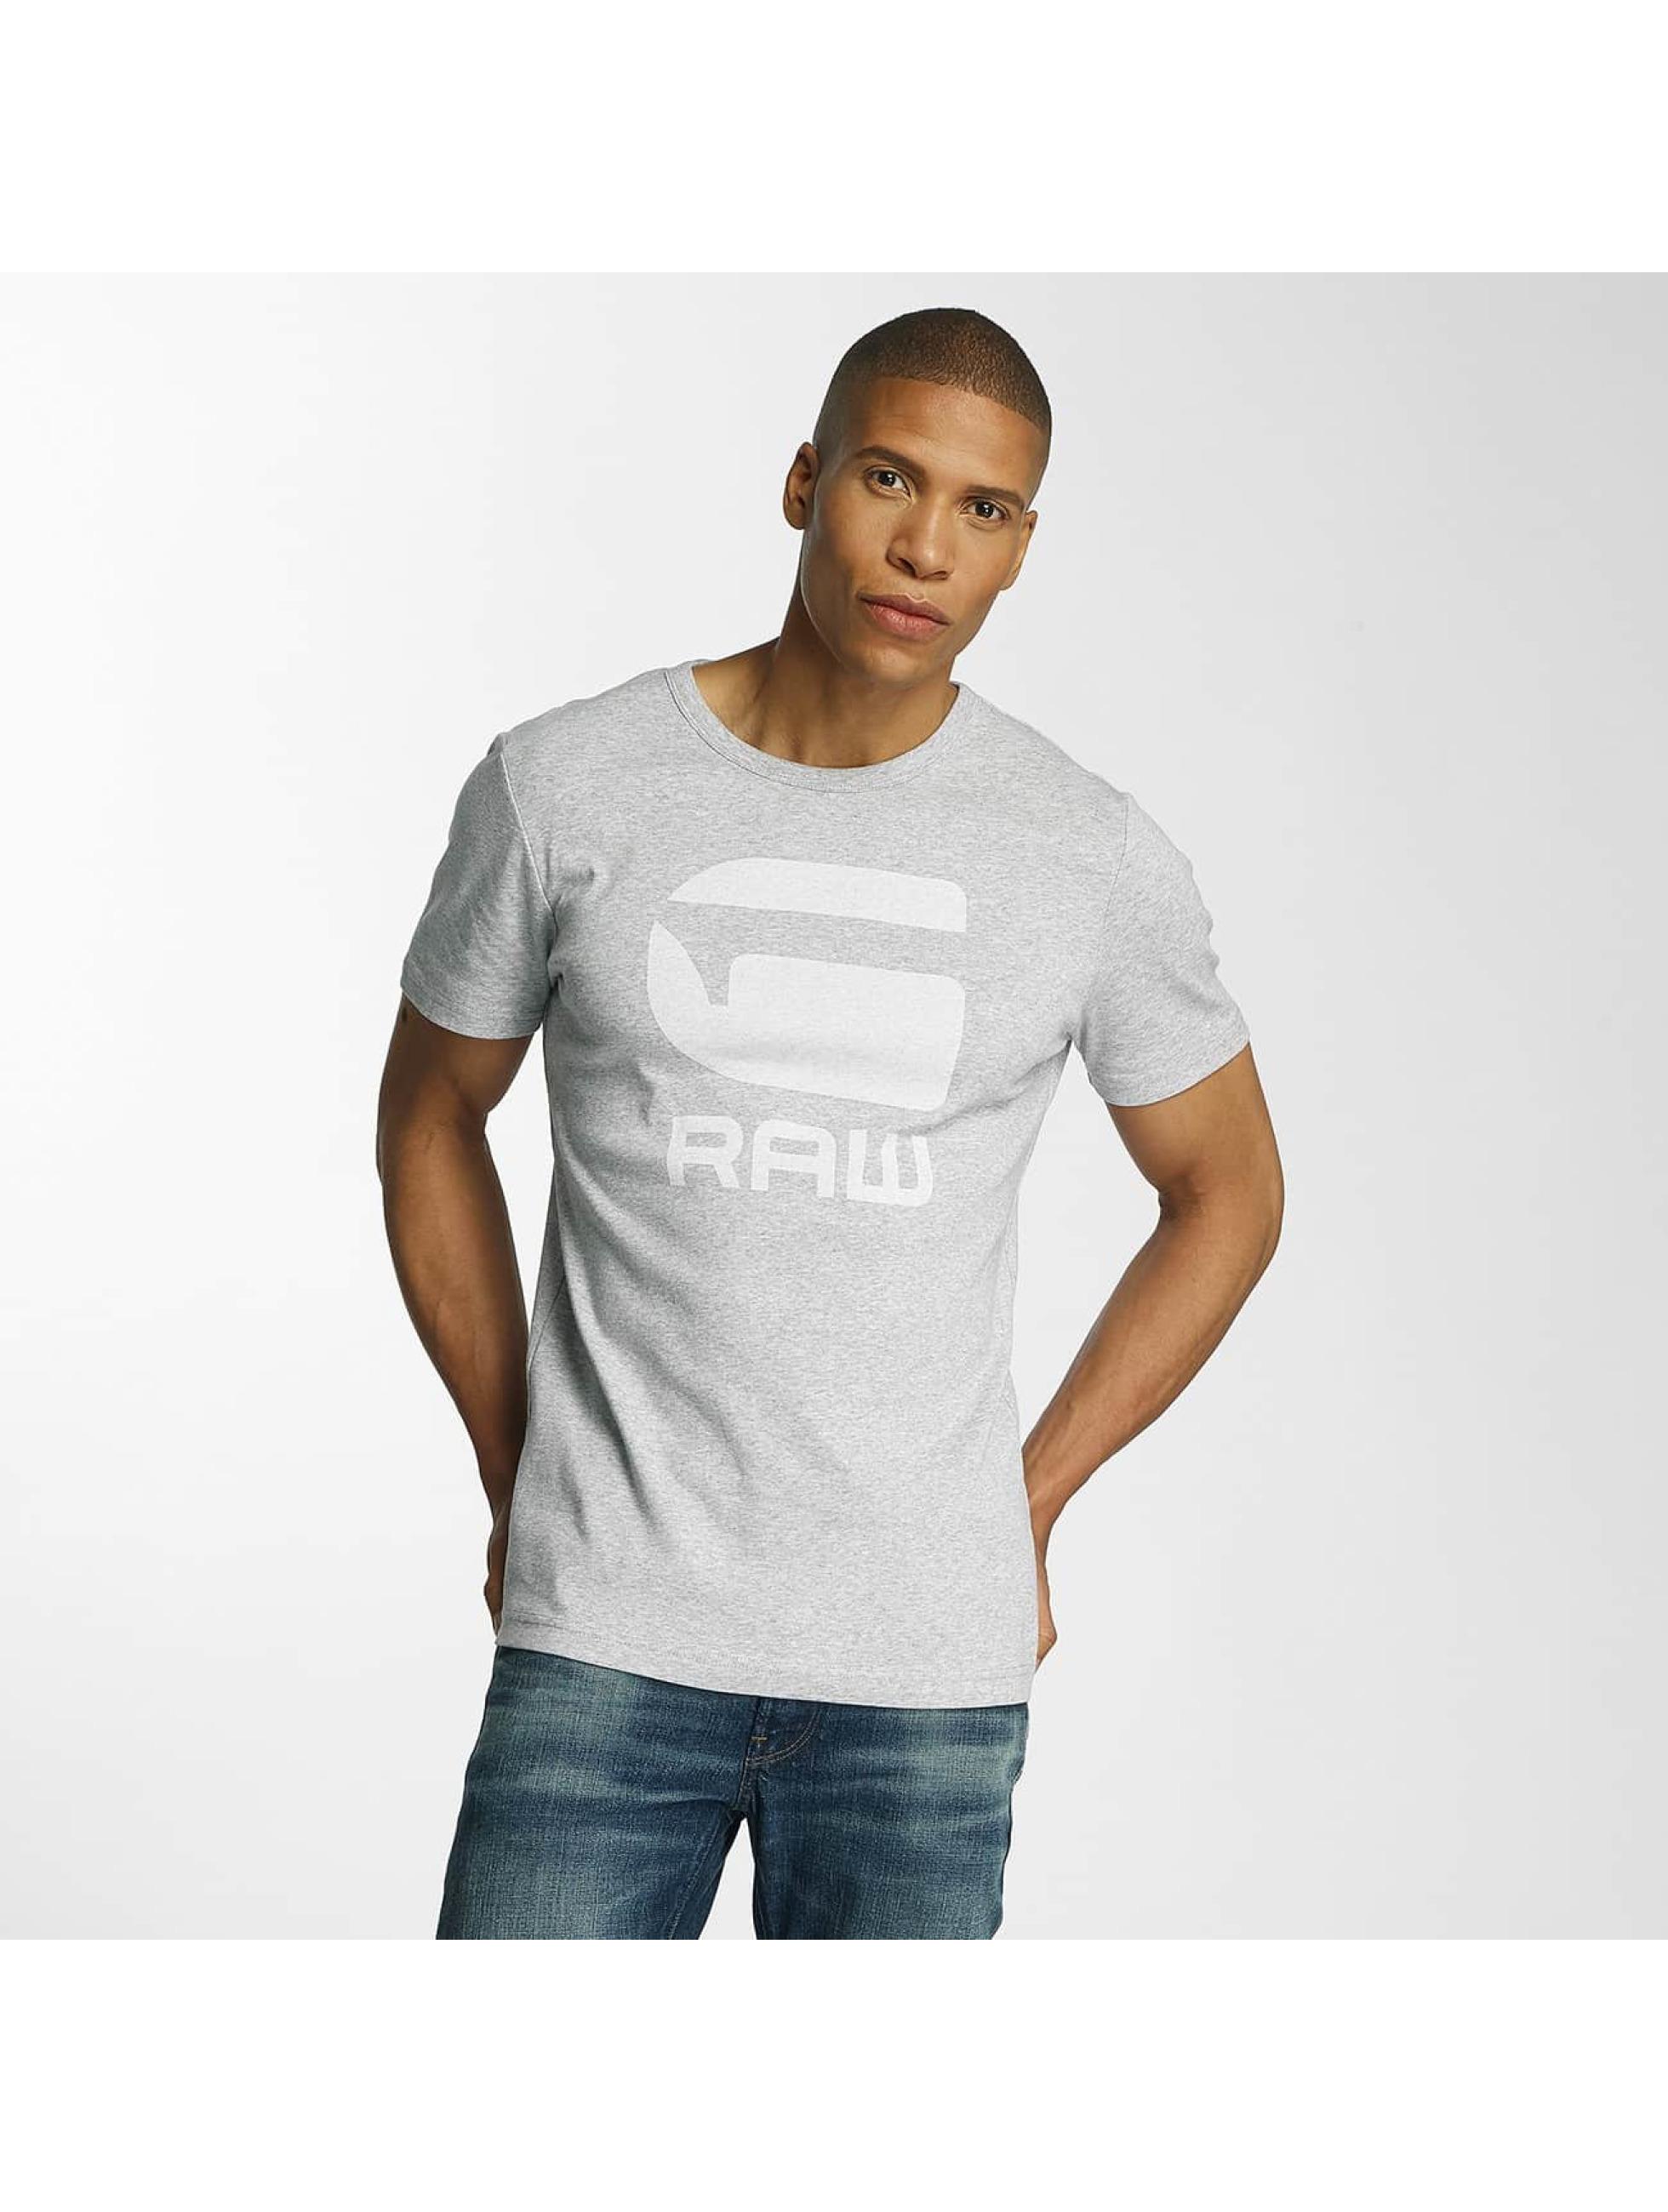 G-Star Männer T-Shirt Drillon Cool Rib in grau